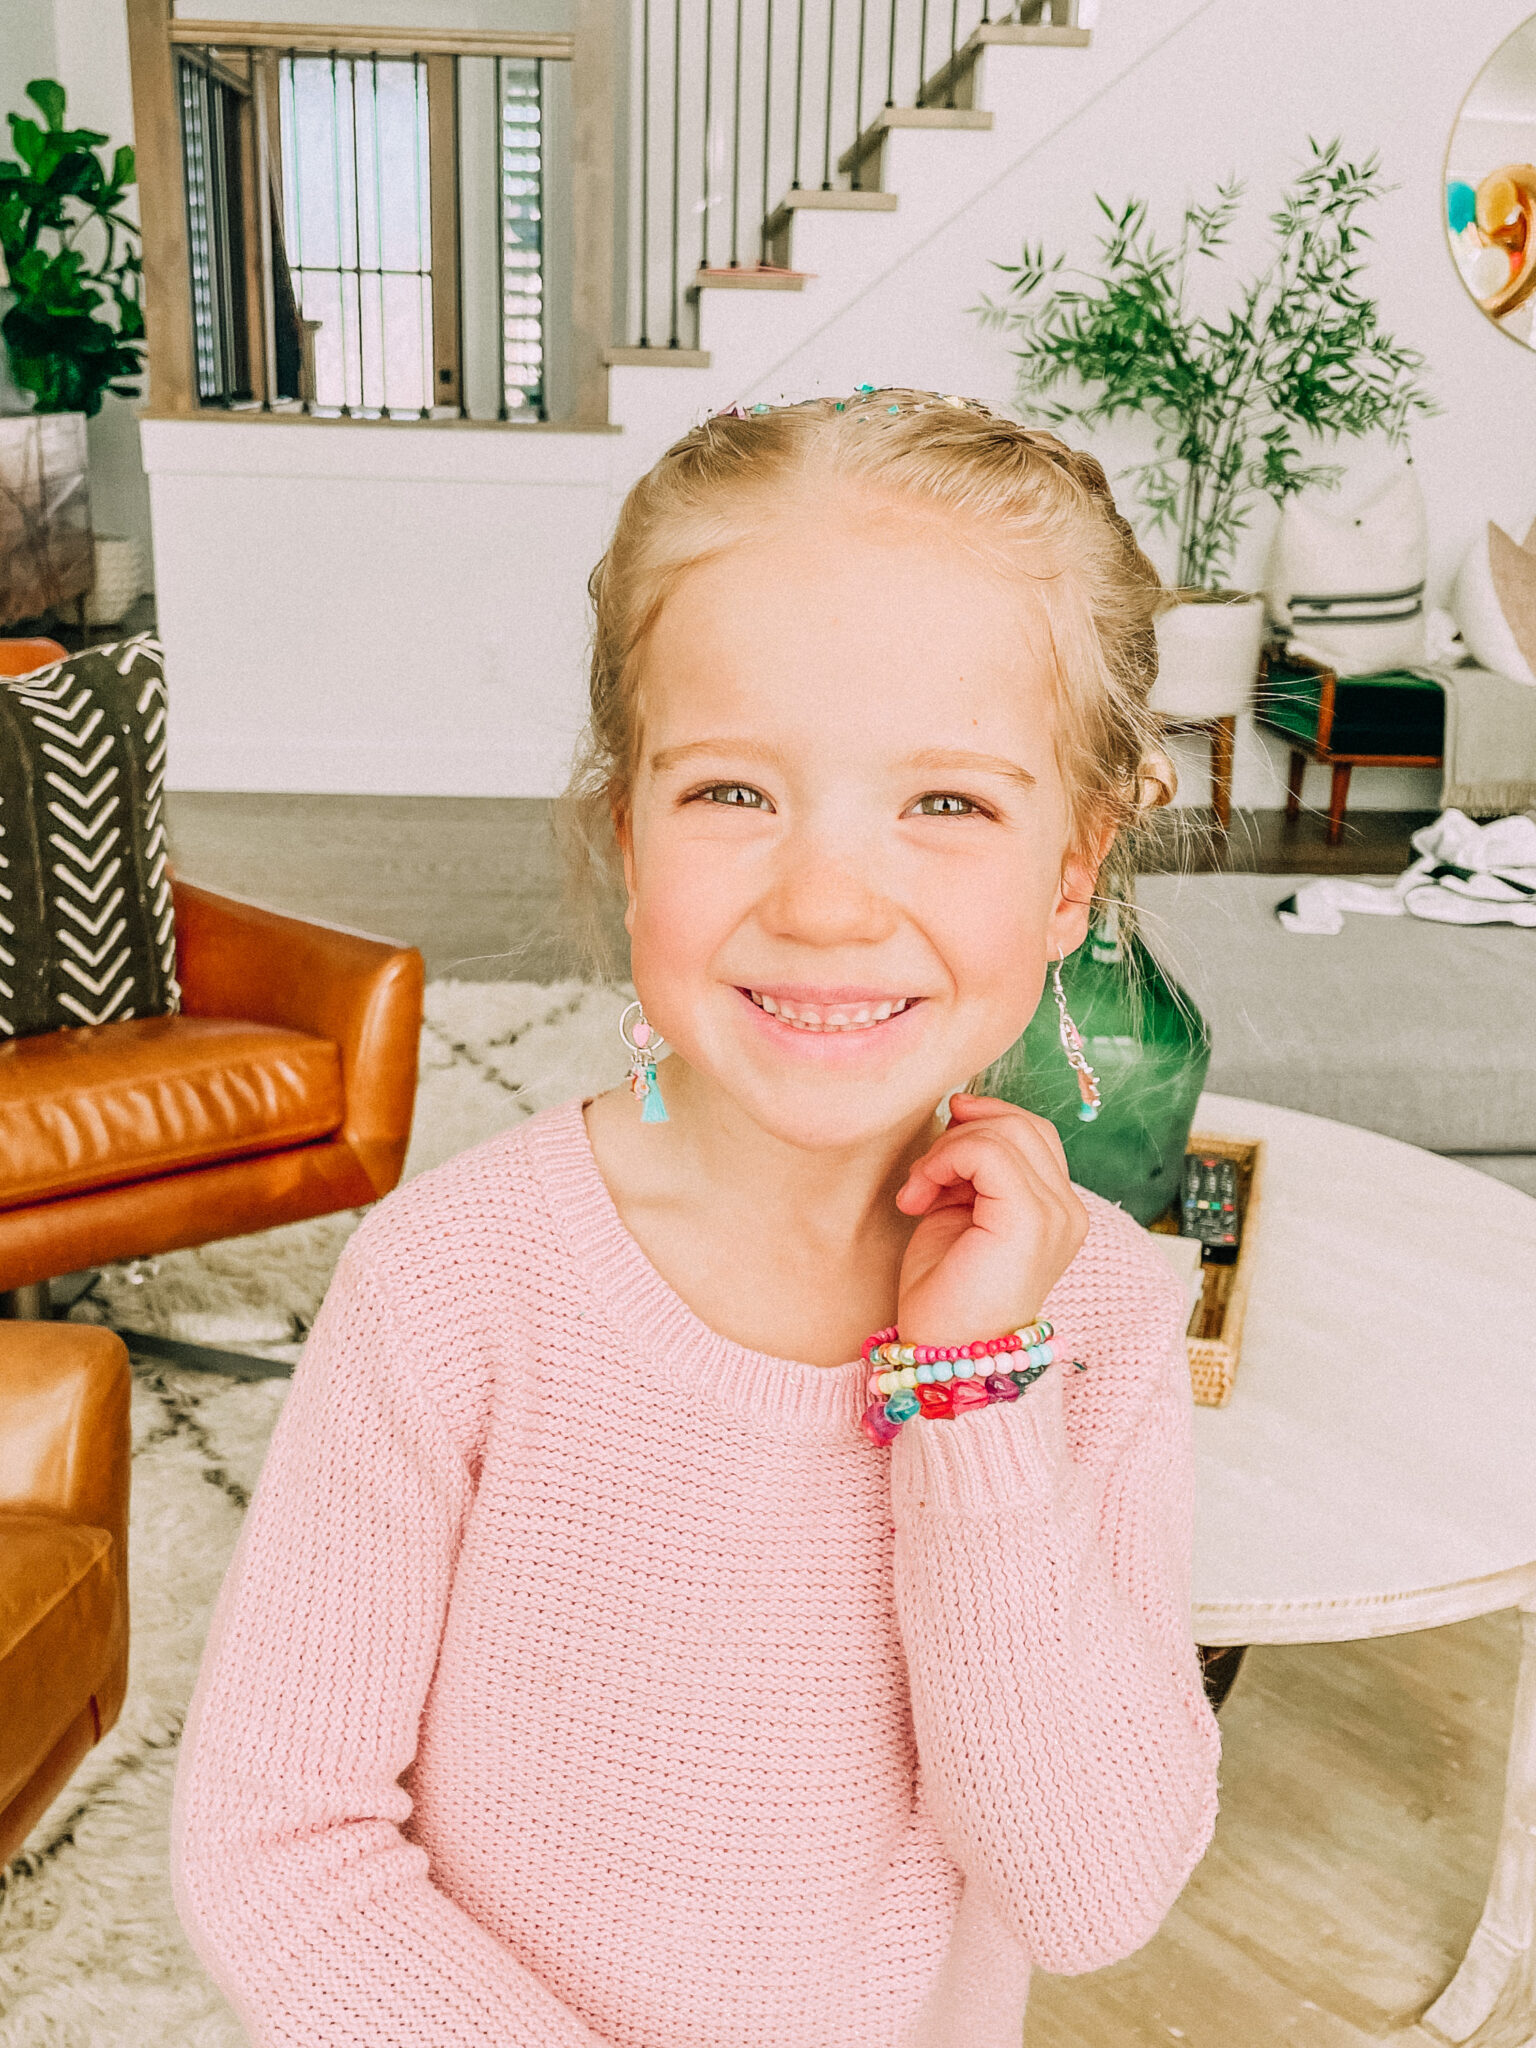 little girl hairstyle twistmepretty.com